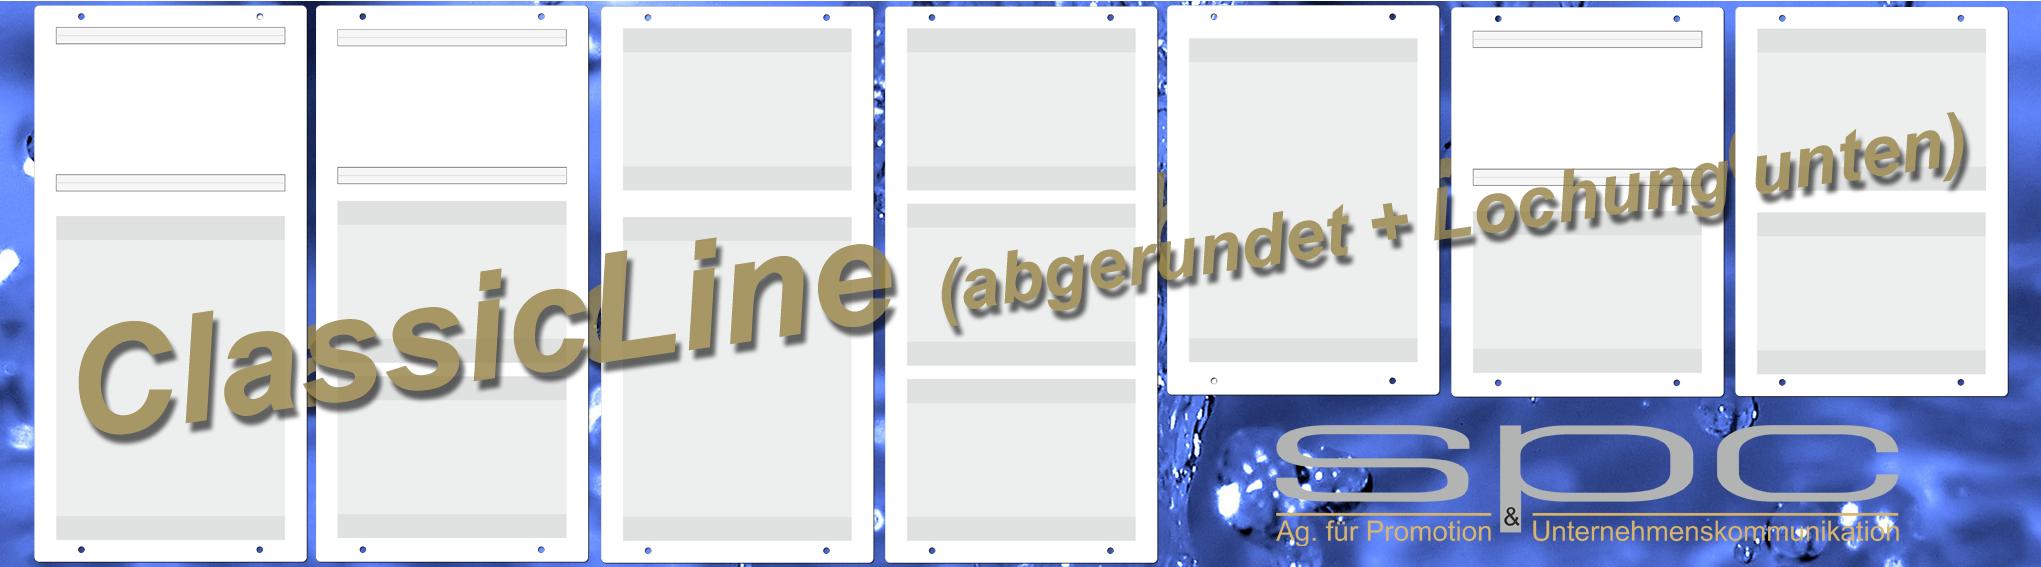 Banner-GS-ClassicLine-abgerundet-Lochung